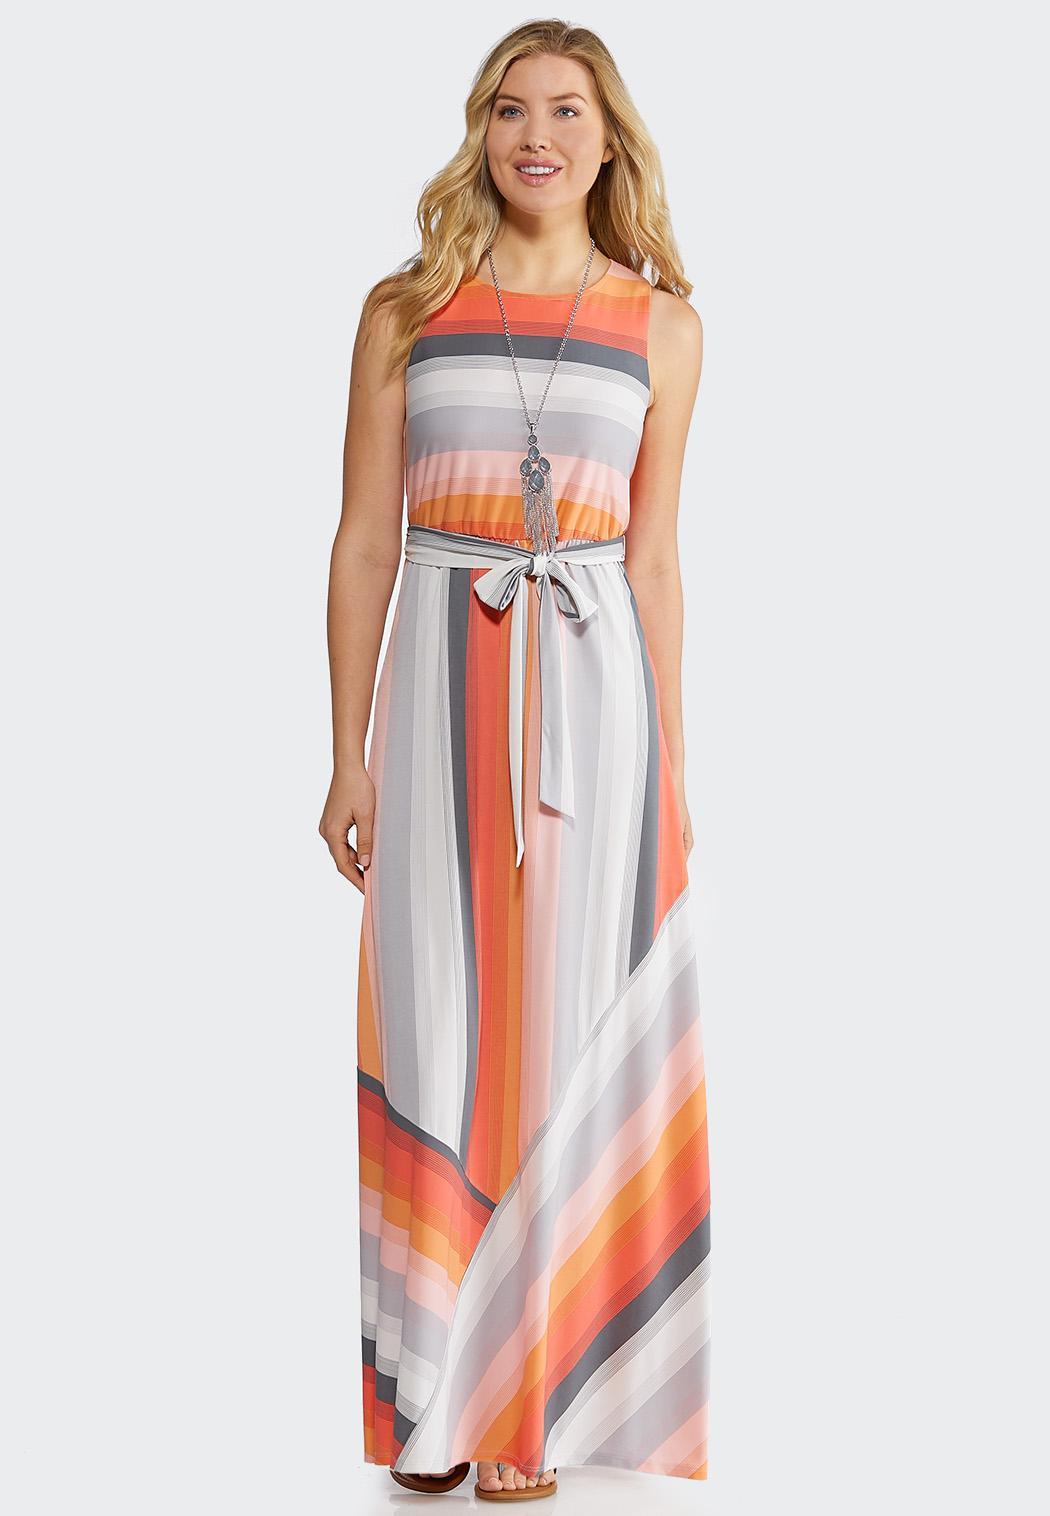 7452dd8ae79 Women s Petite Clothing  Dresses